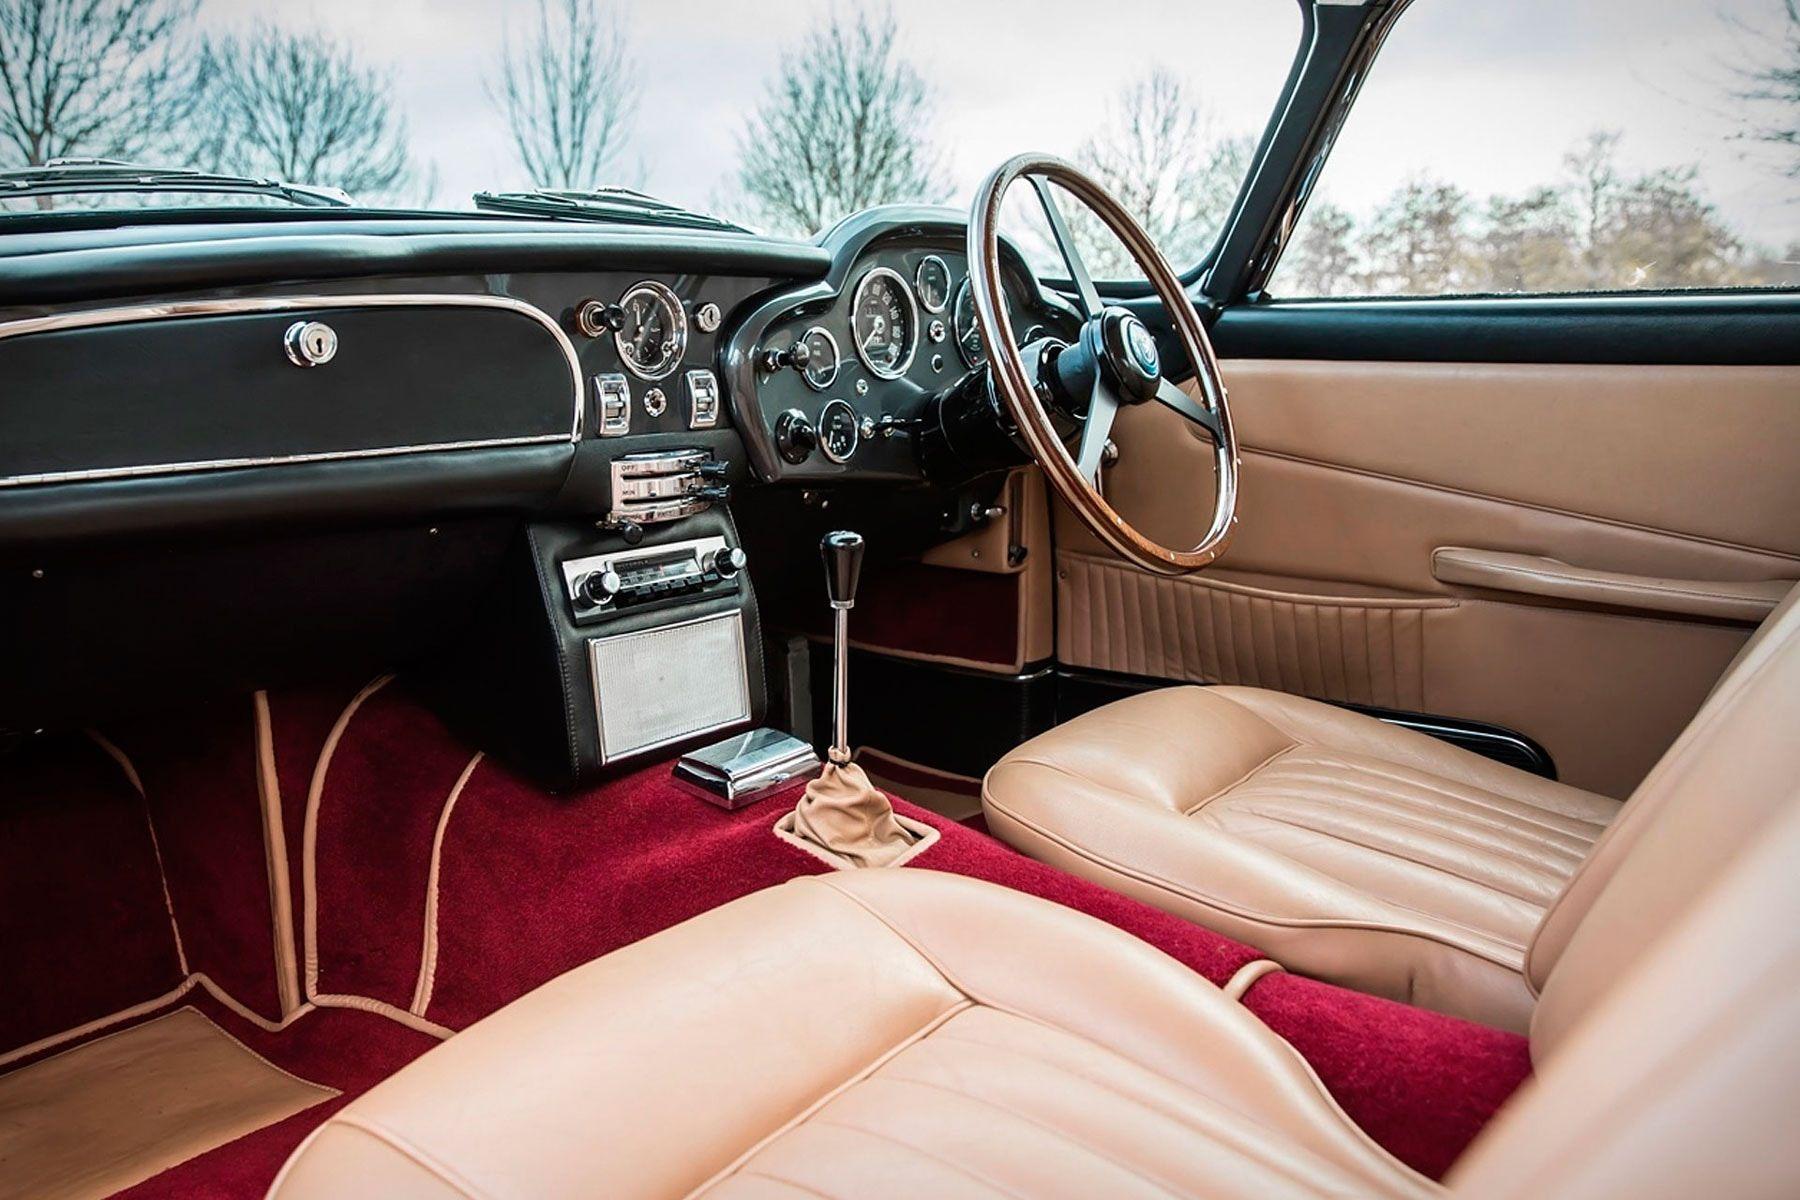 Led Zeppelin Frontman Robert Plants Aston Martin DB Up For - 1964 aston martin for sale